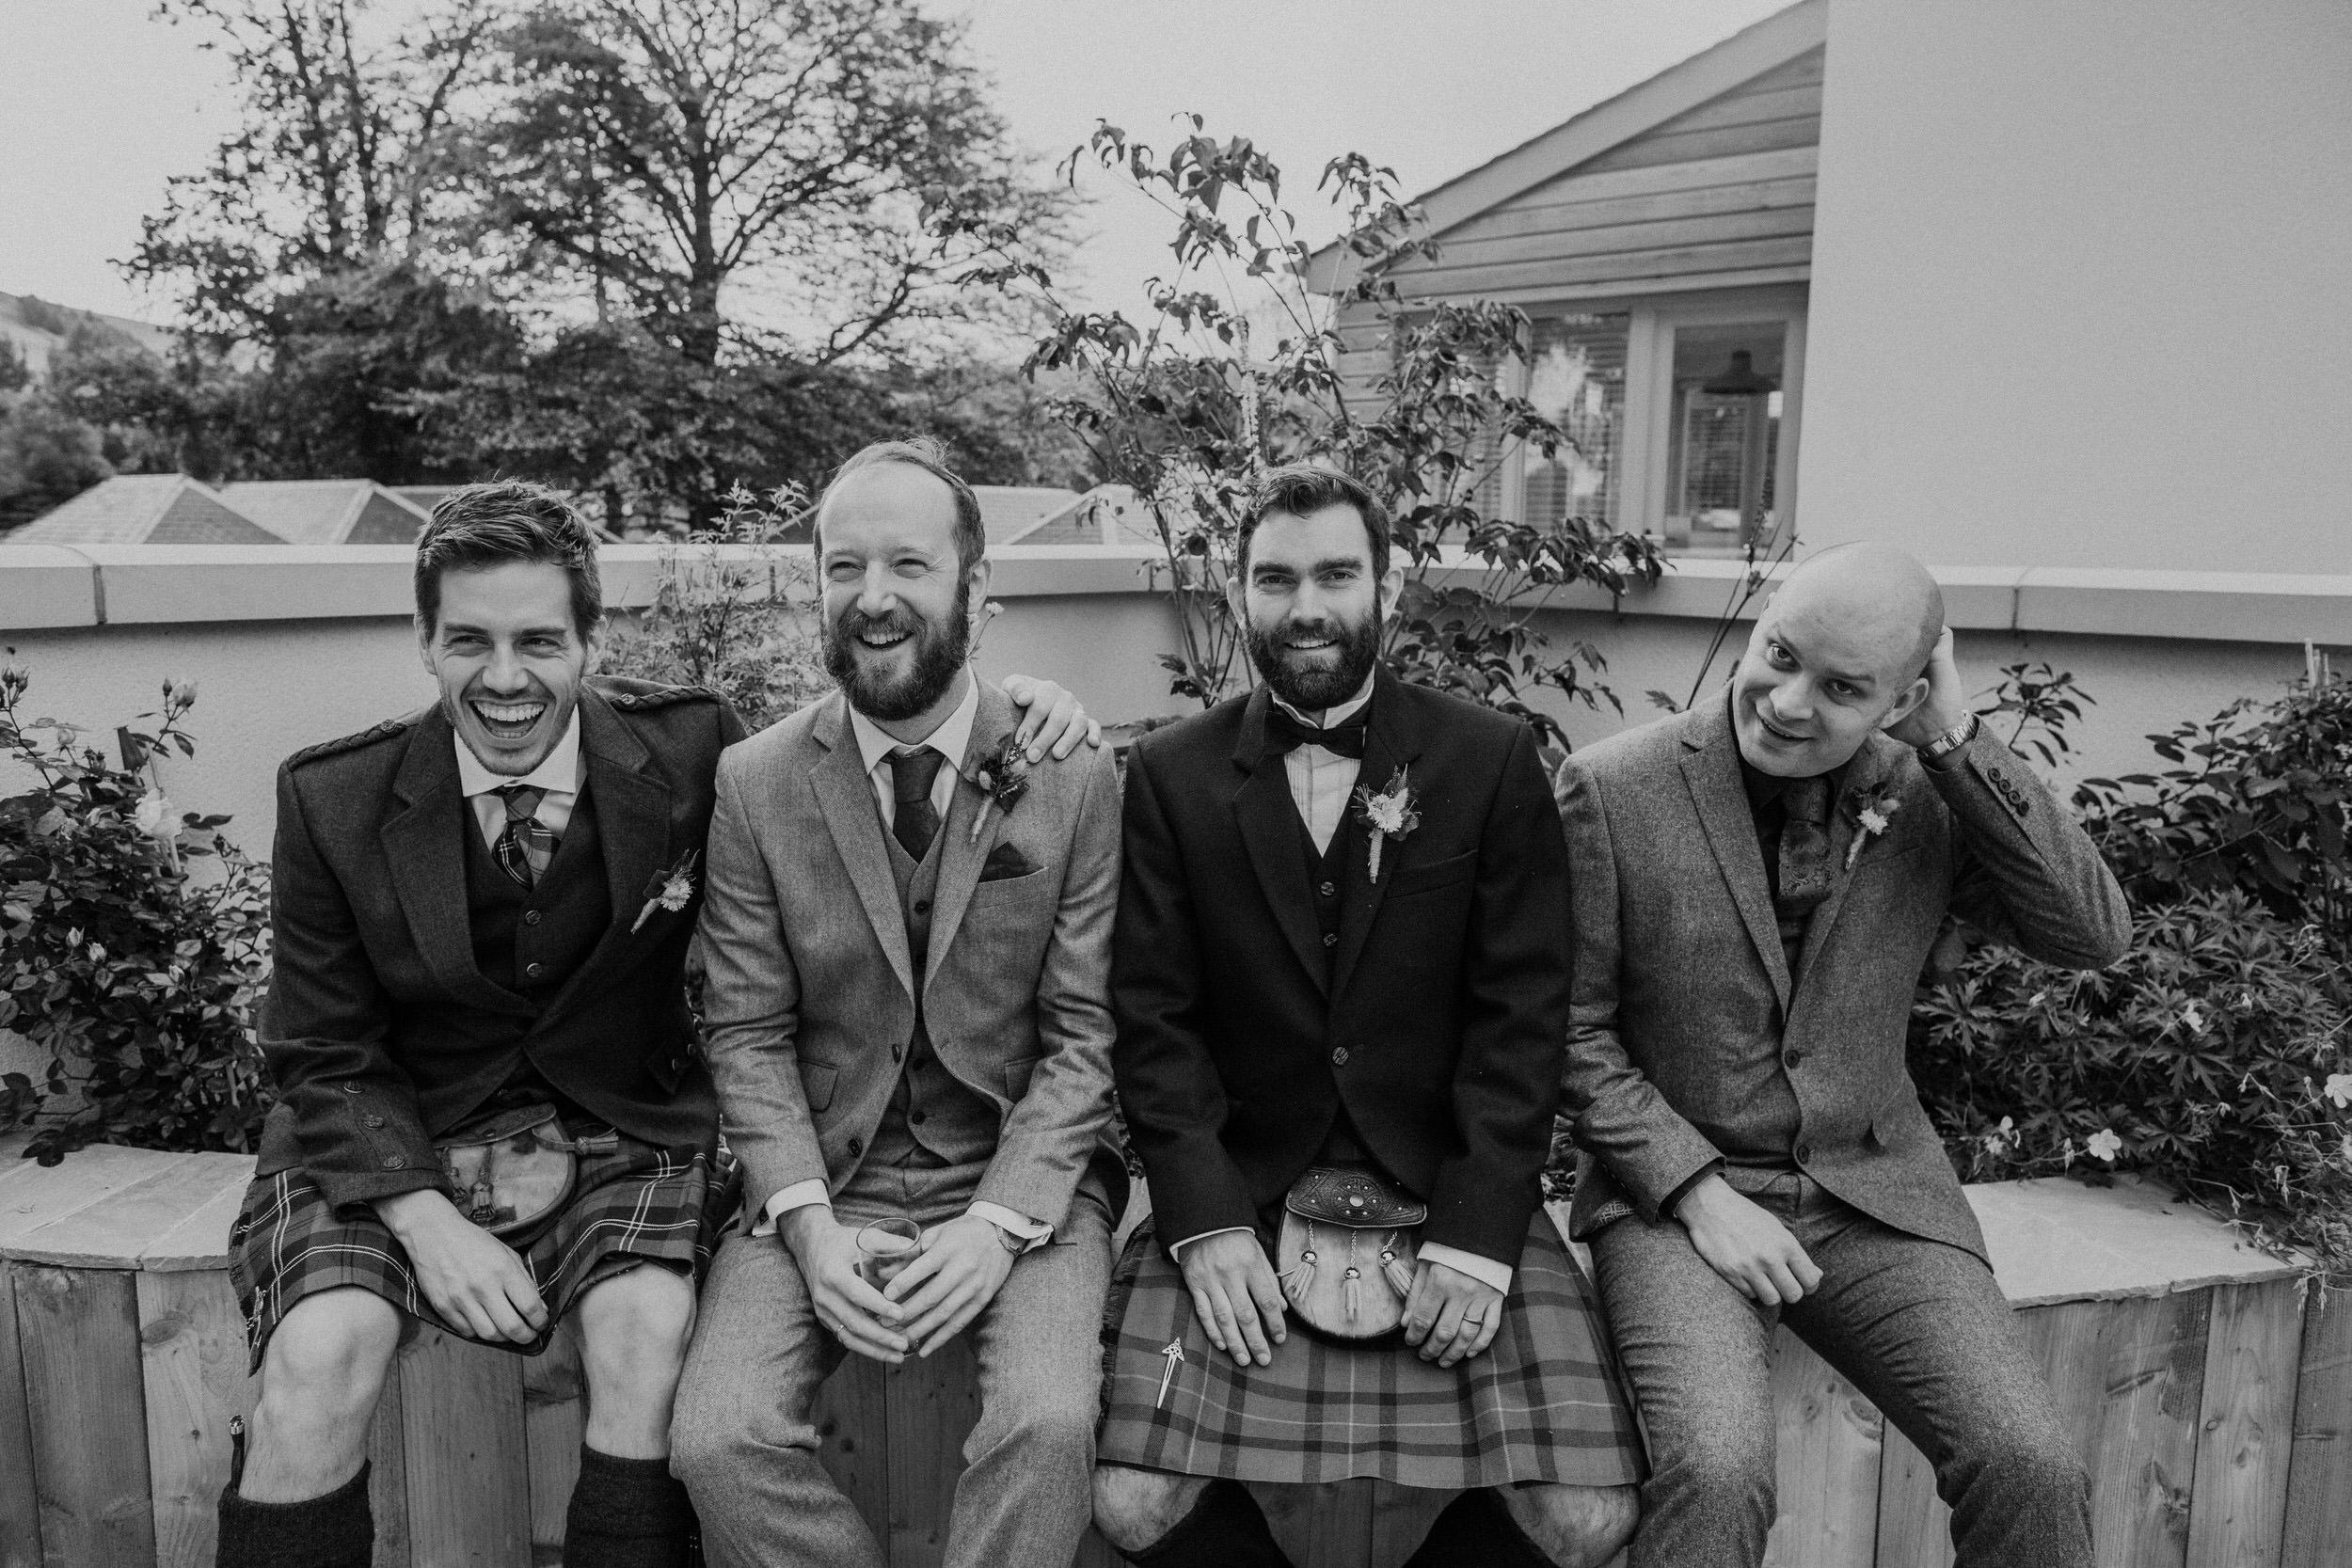 Quirky Wedding Photography Scotland Borders Biggar Hartree 020.jpg